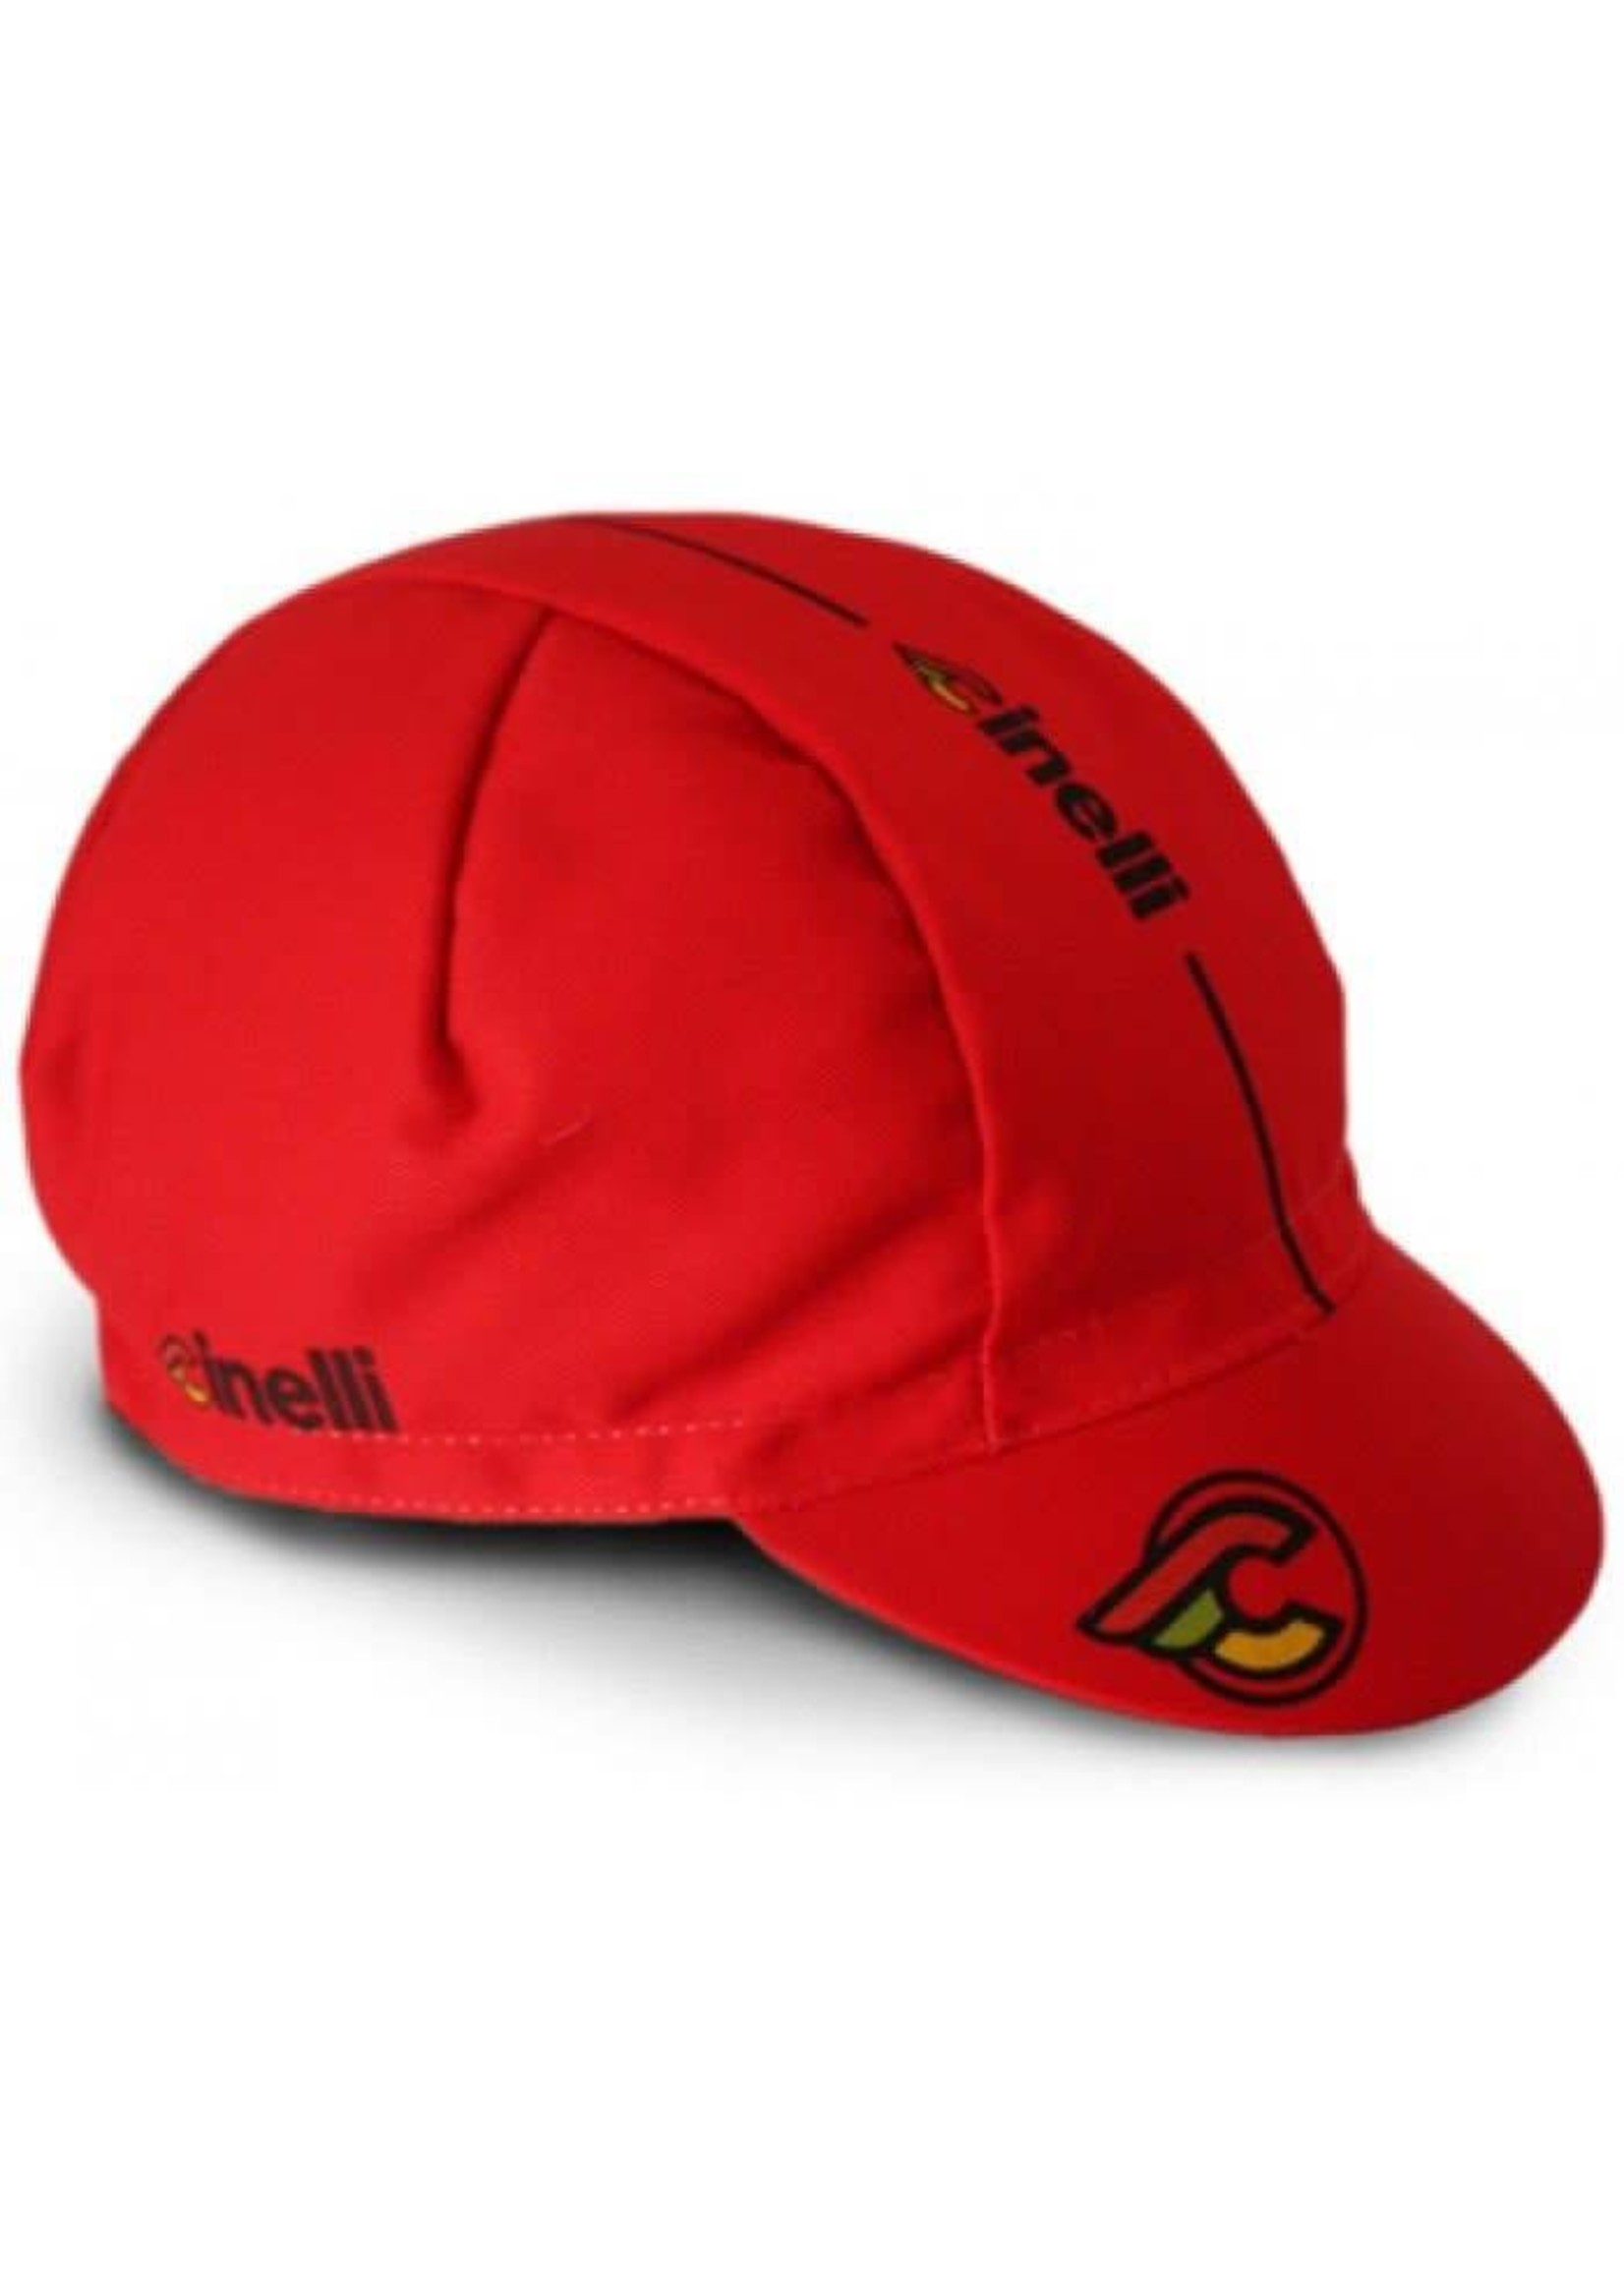 CINELLI CINELLI CAPS SUPERCORSA, RED